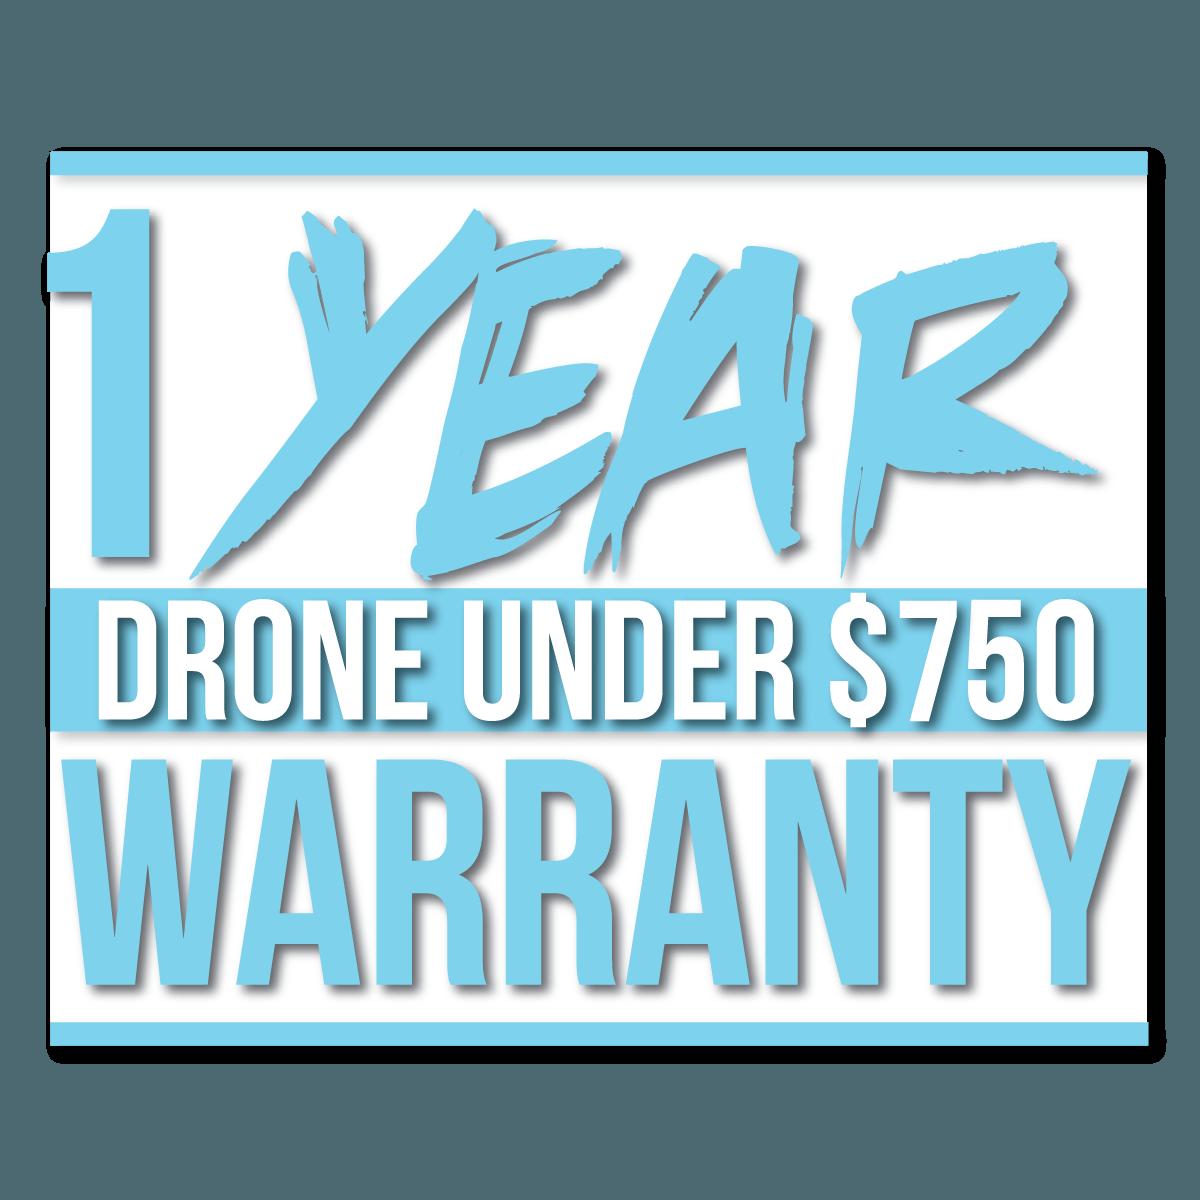 cps-warranty-verydrone-750-drone-phantom-typhoon-H-realsens